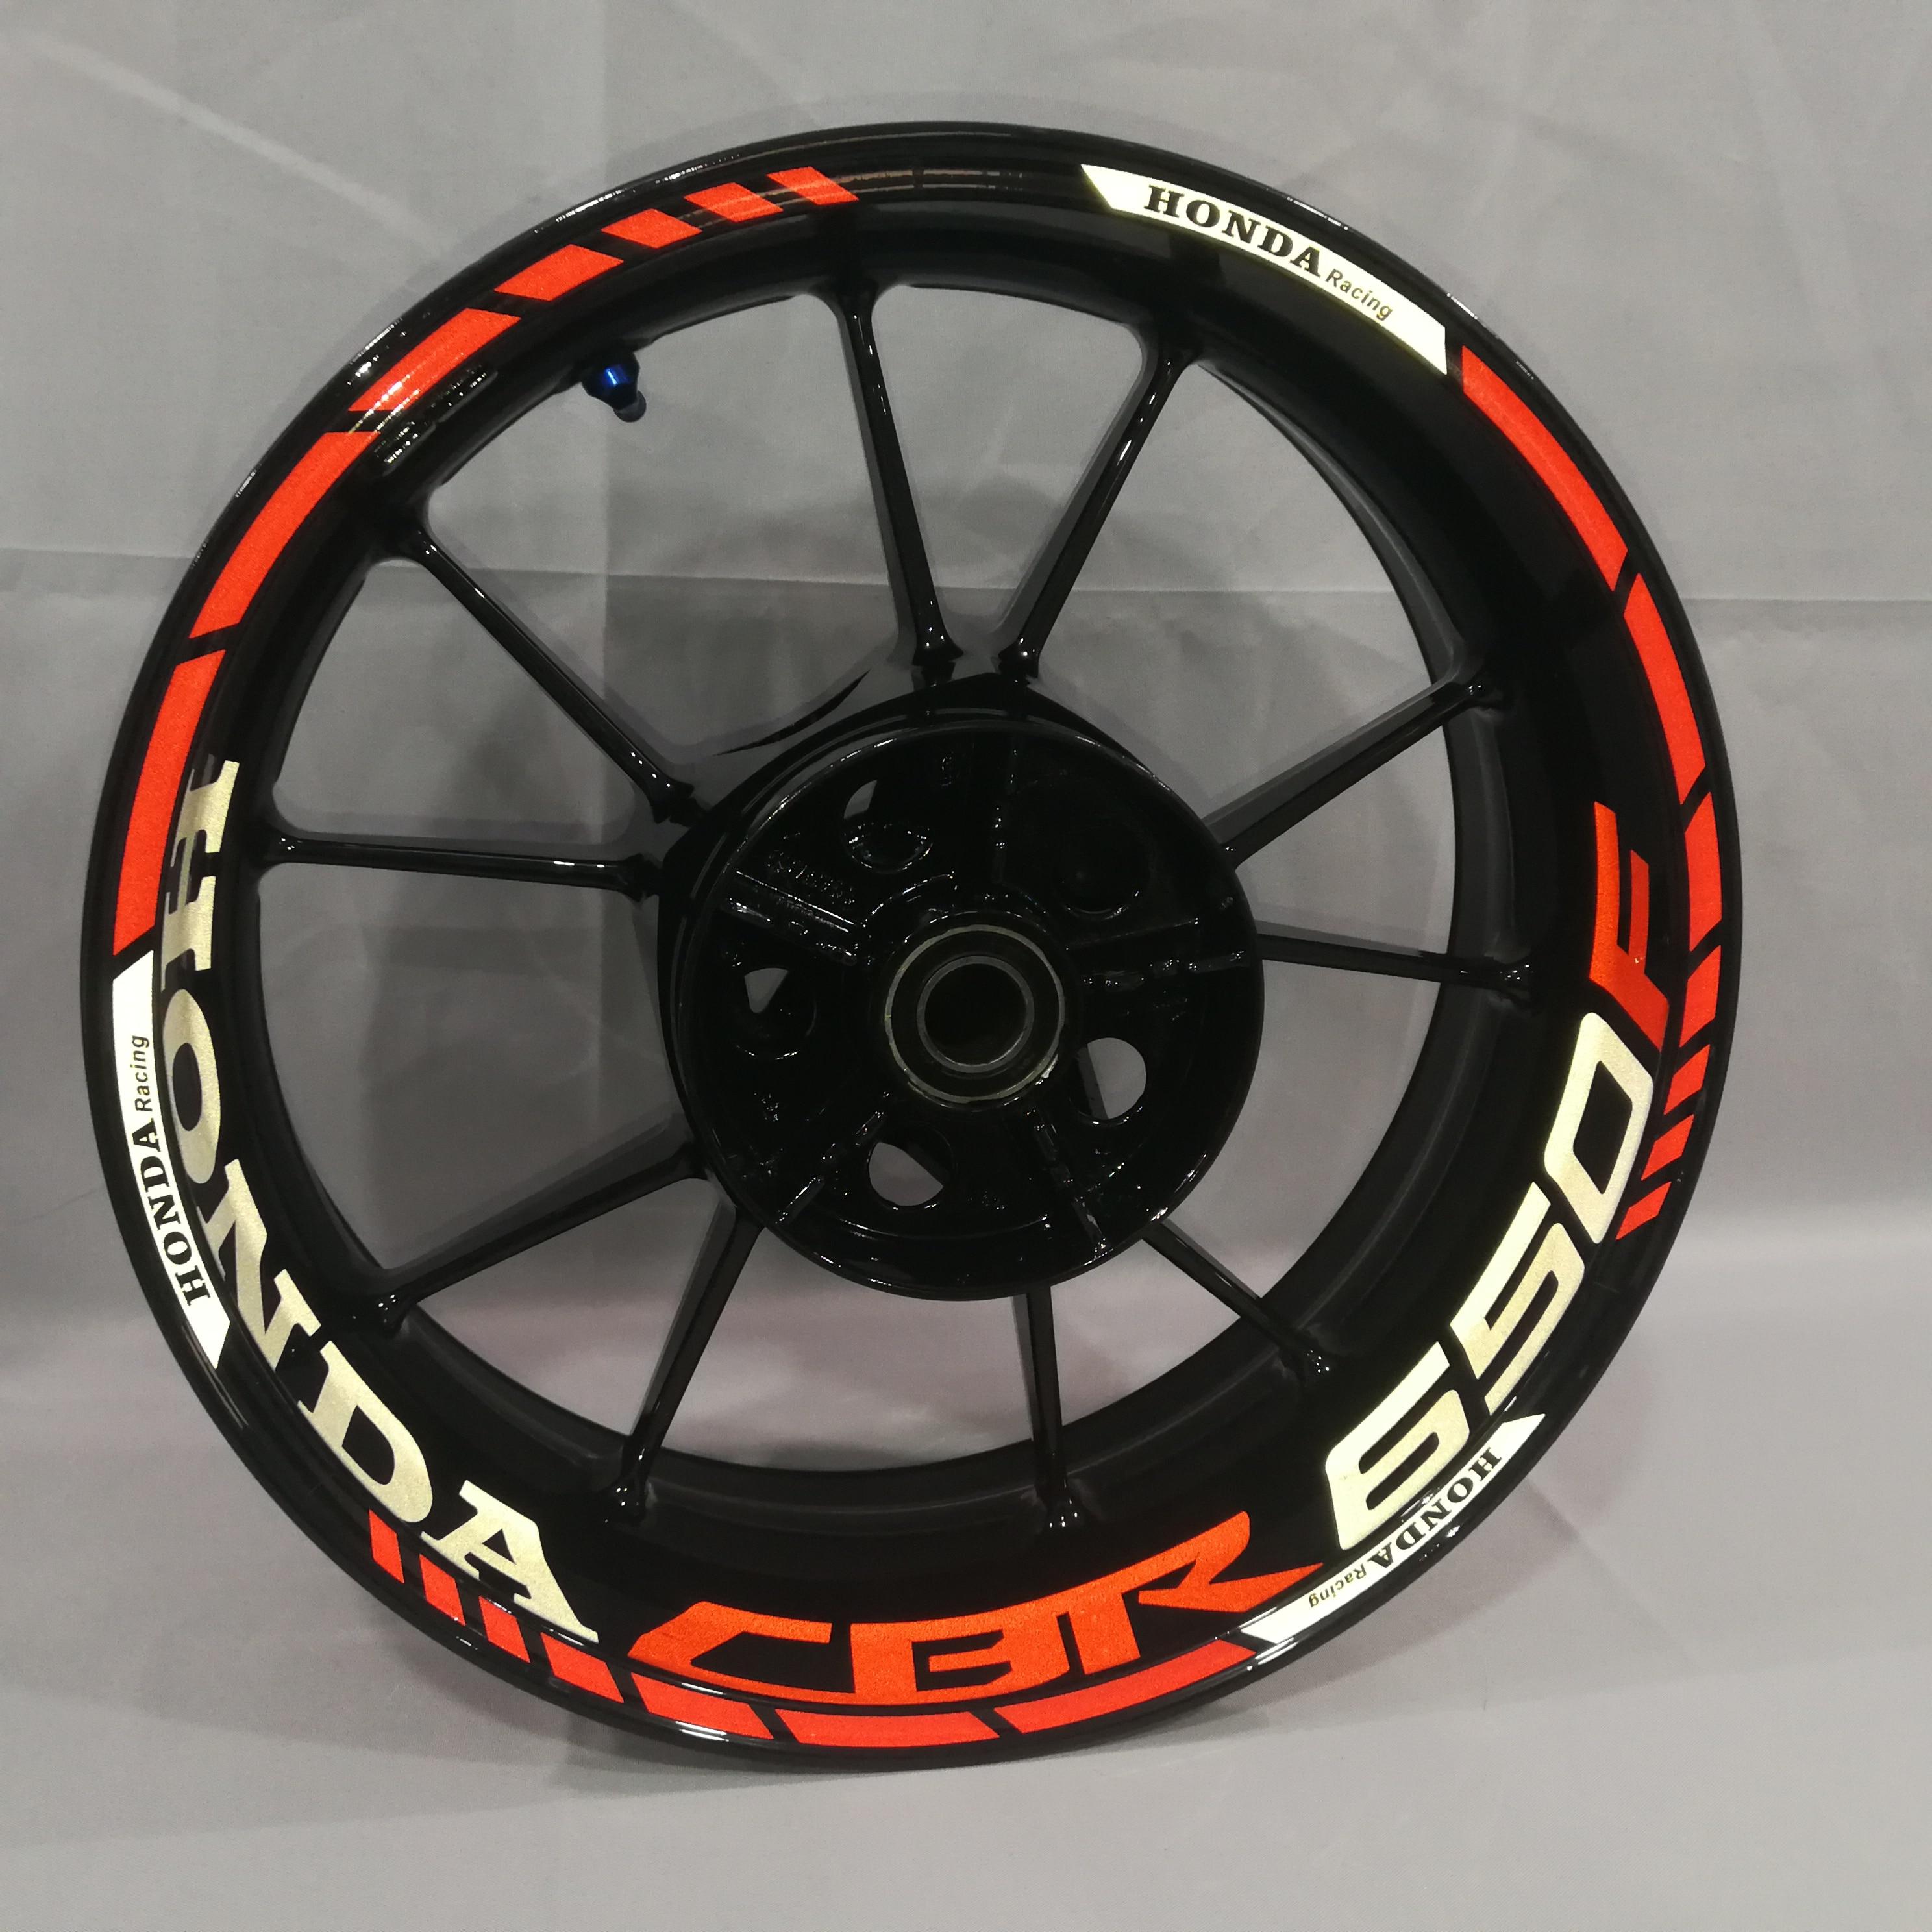 For Honda CBR650F Motorcycles Wheel Stickers Waterproof Reflective Rim Decals Front & Rear Custom Inner Rim